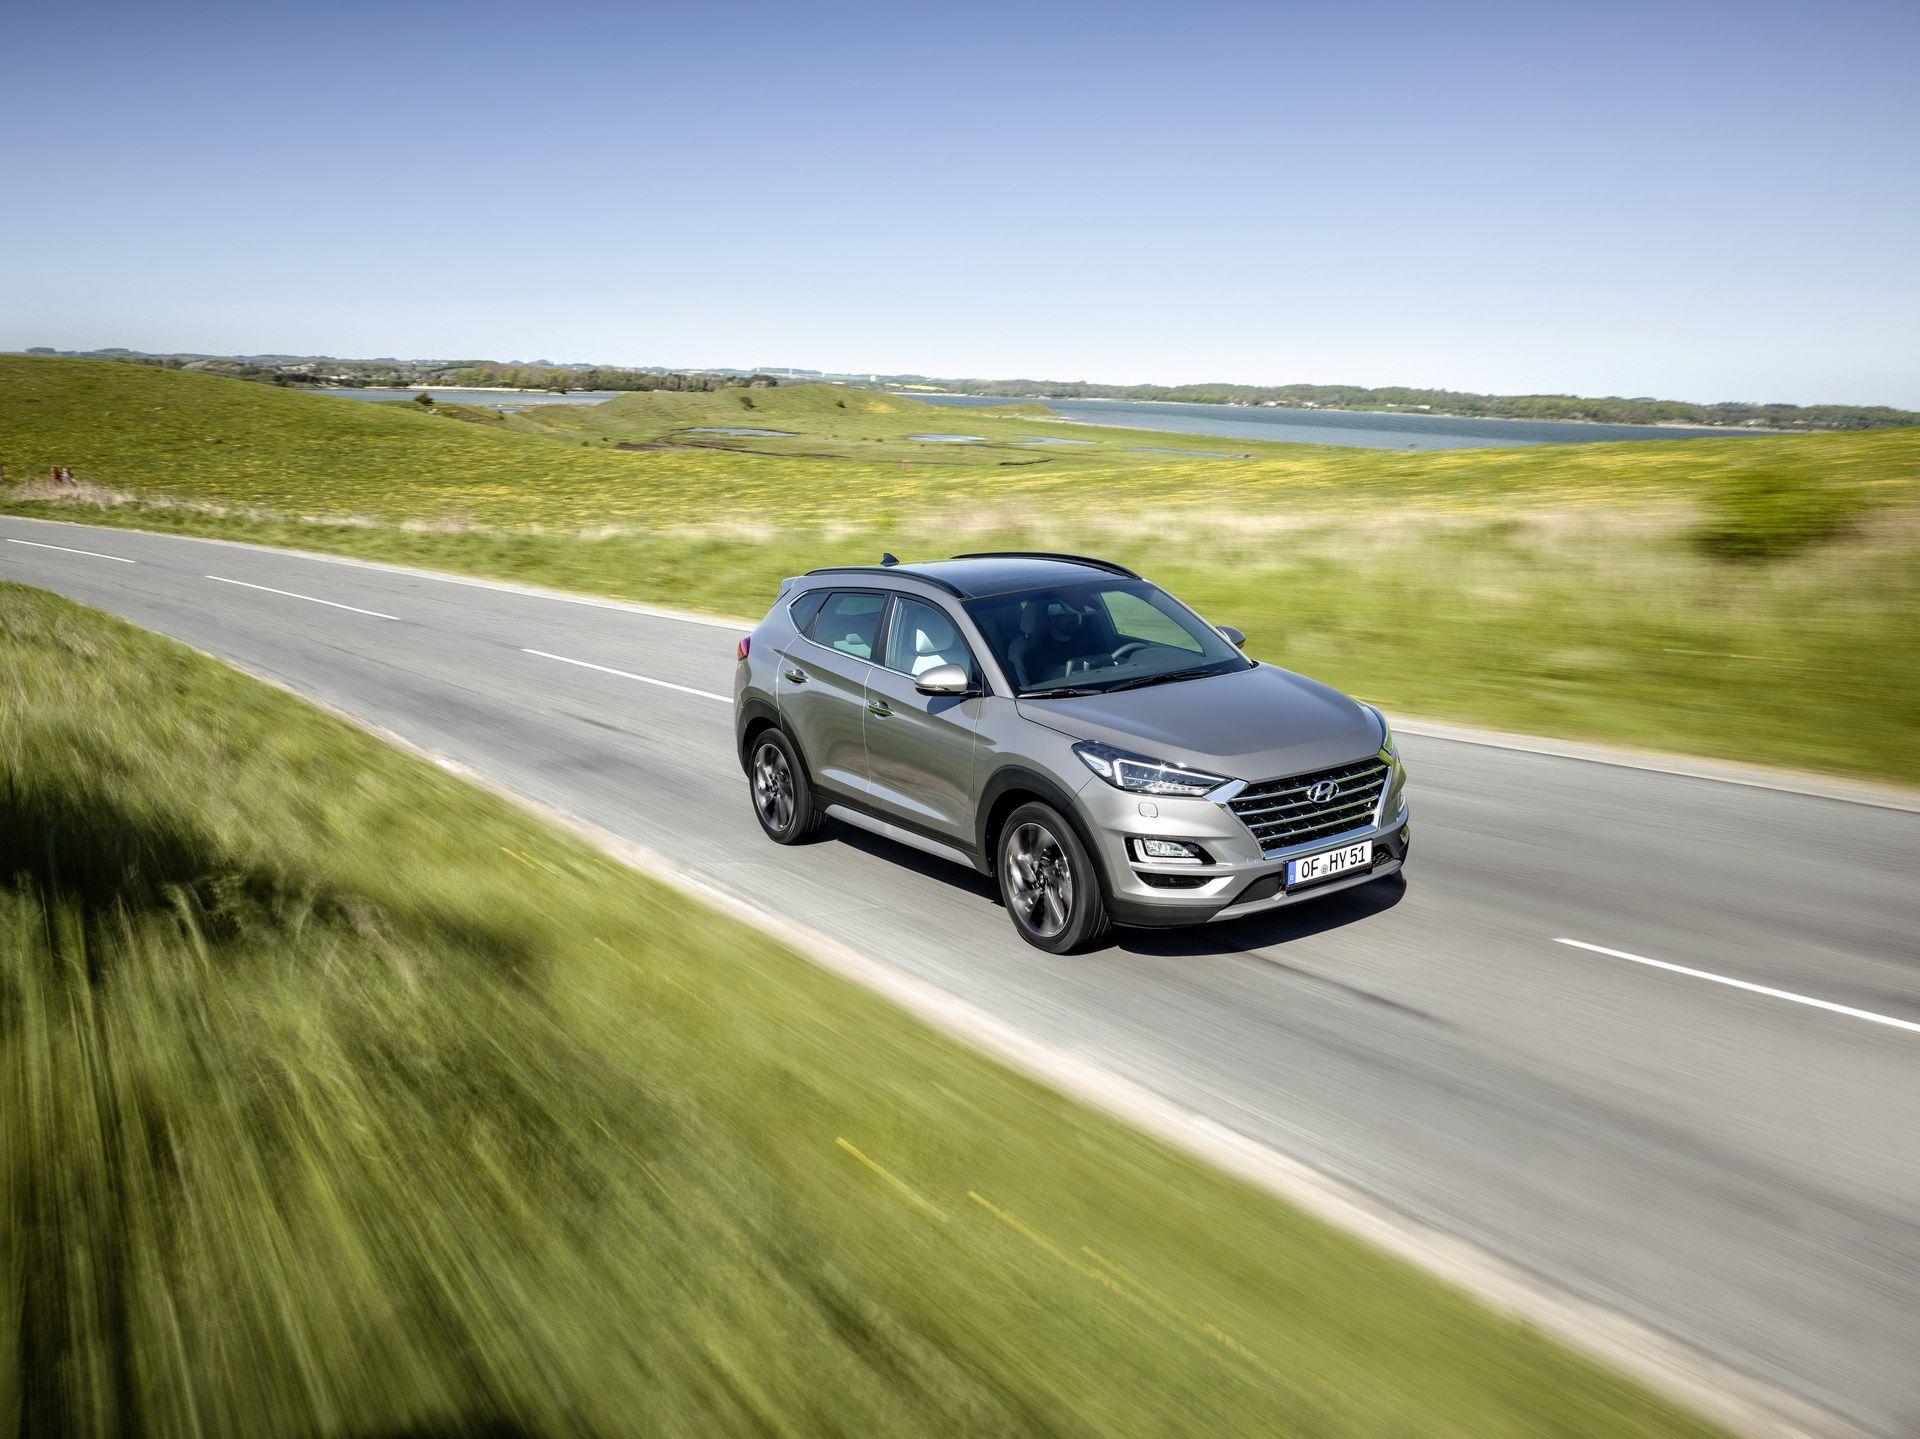 Hyundai-Tucson-2019-xe-sach-va-tiet-kiem-nho-Hybrid-diesel-anh-1